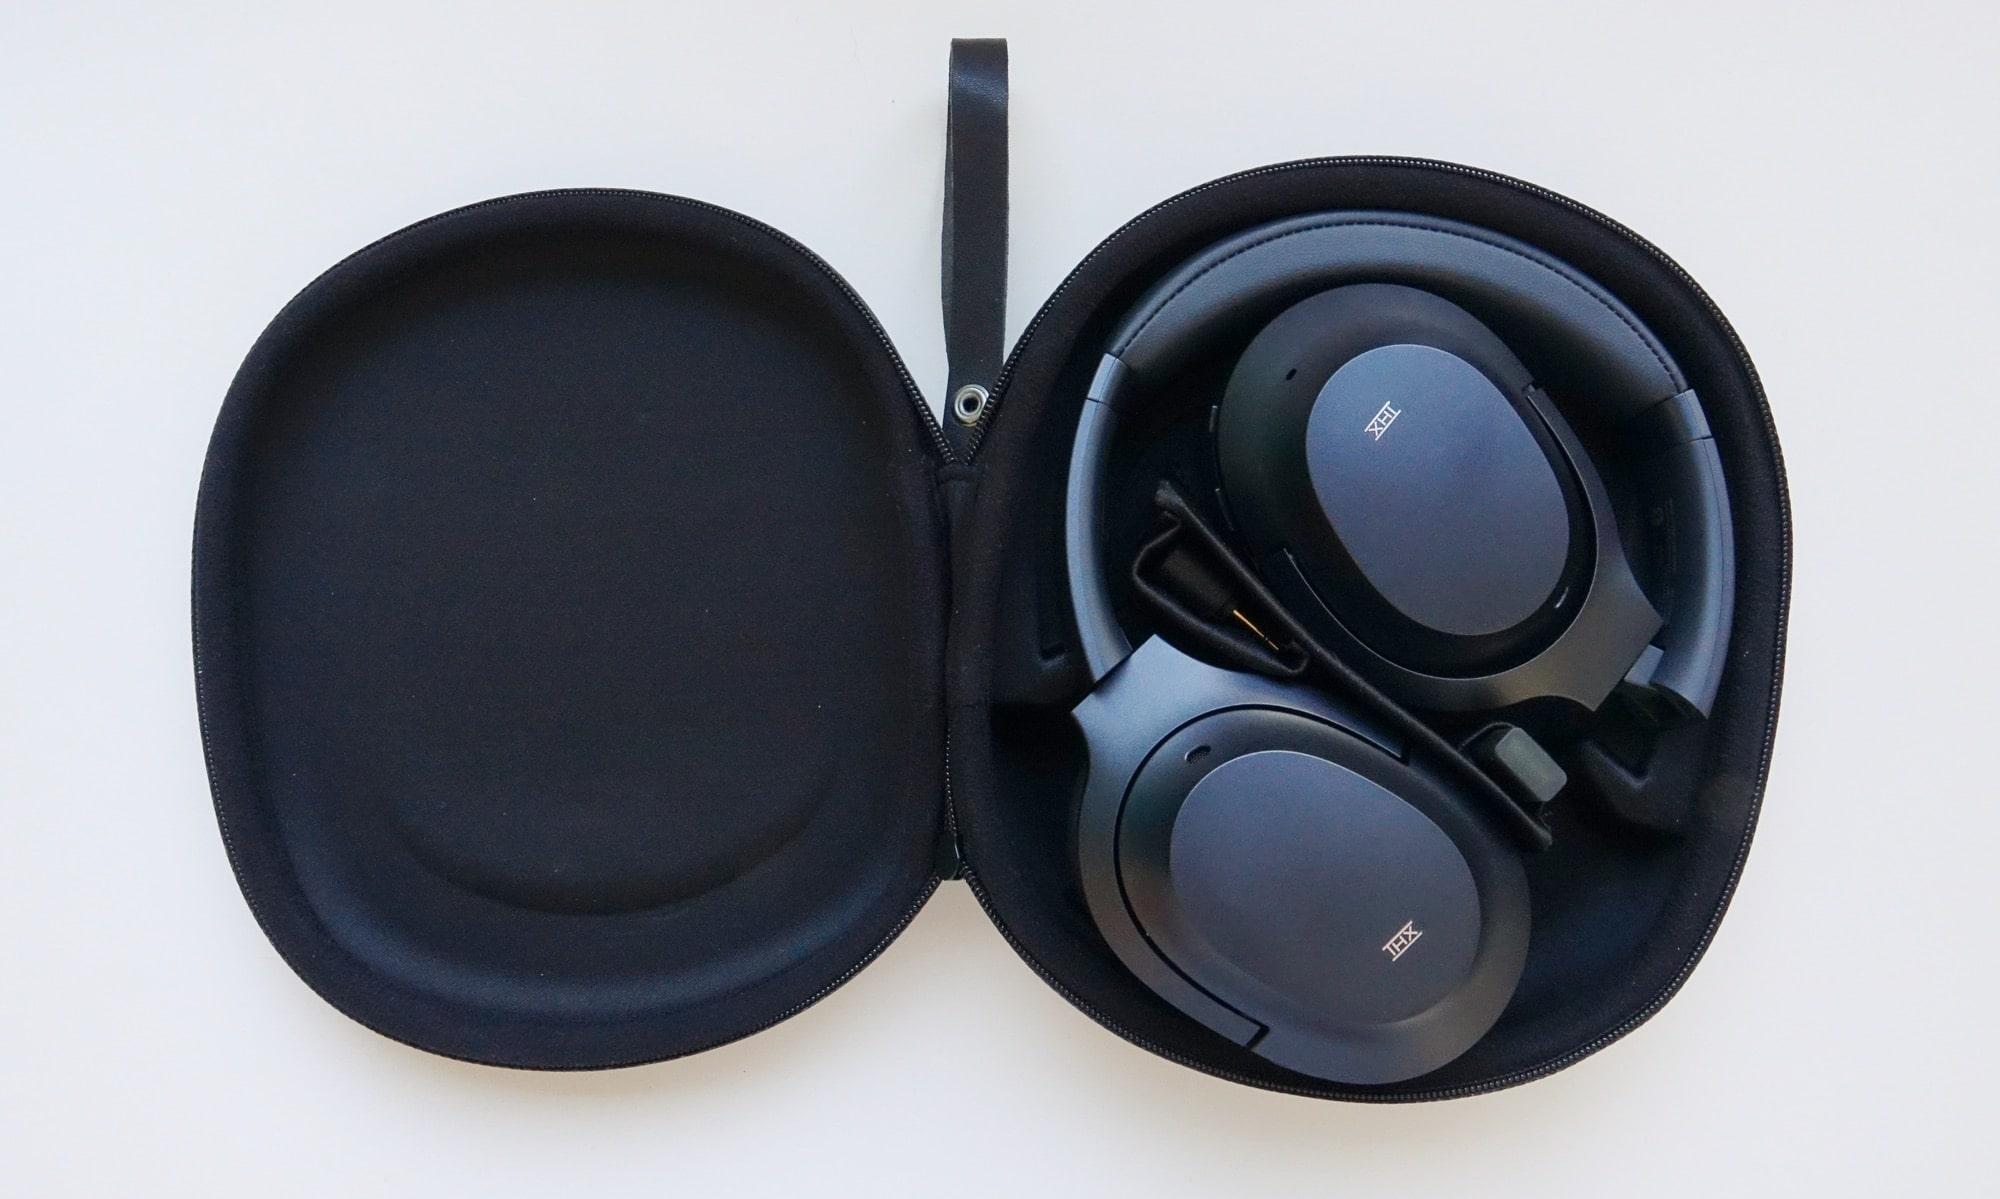 The case for the Razer Opus THX headphones